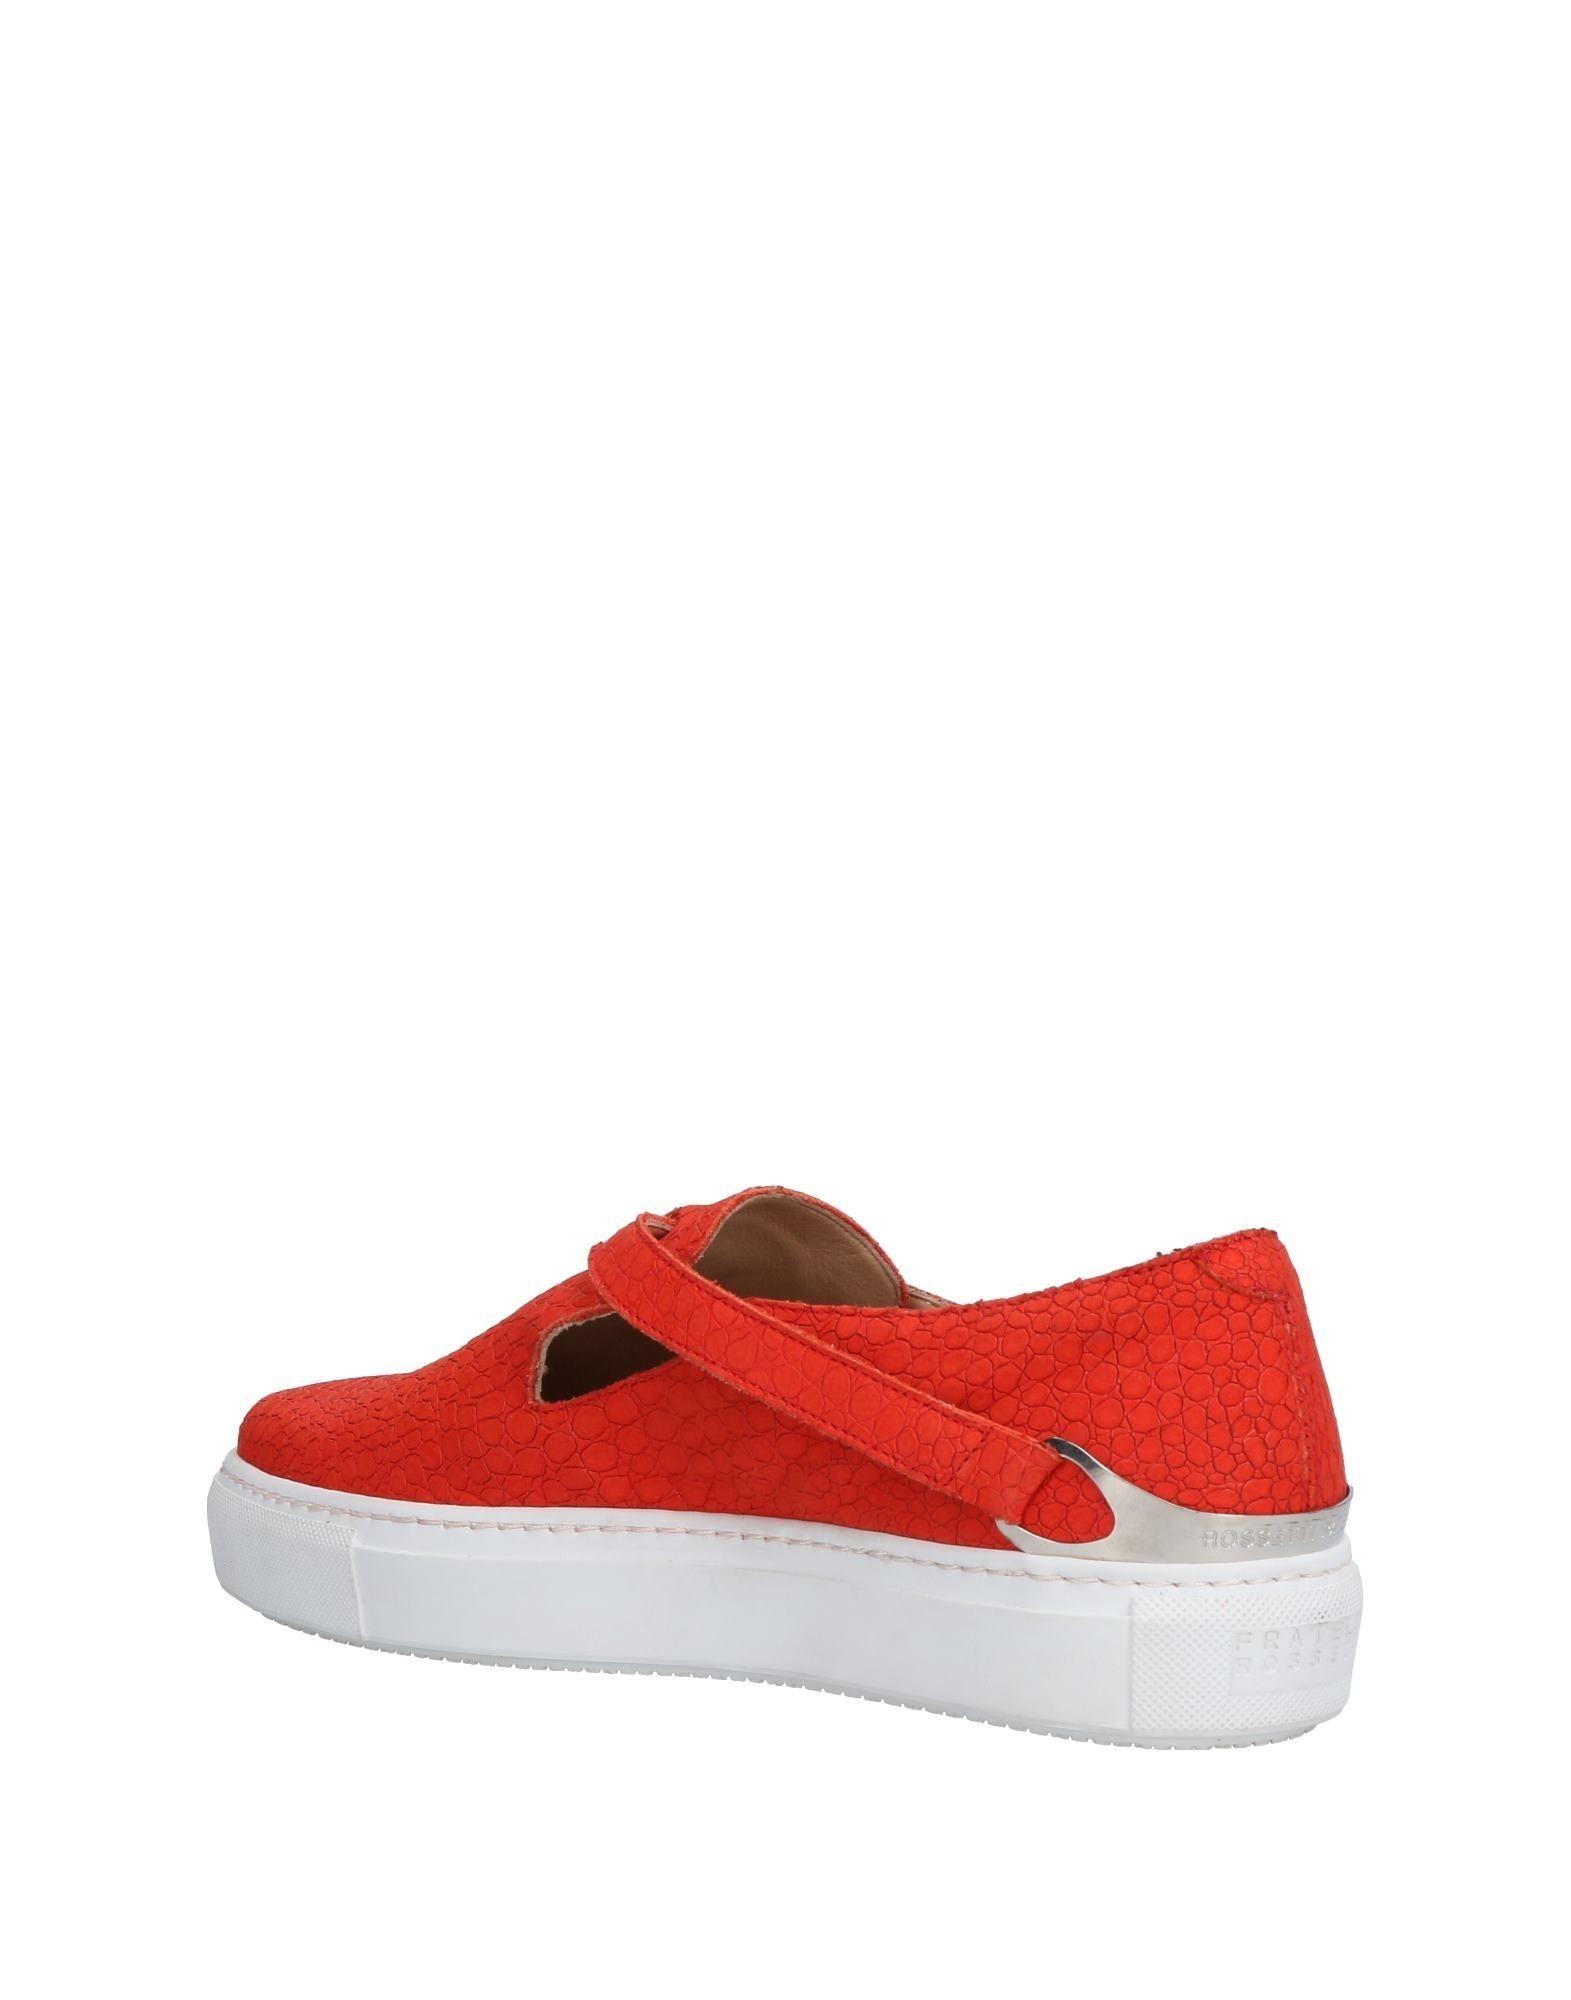 Stilvolle billige billige billige Schuhe Fratelli Rossetti Sneakers Damen  11440611VR 76d041